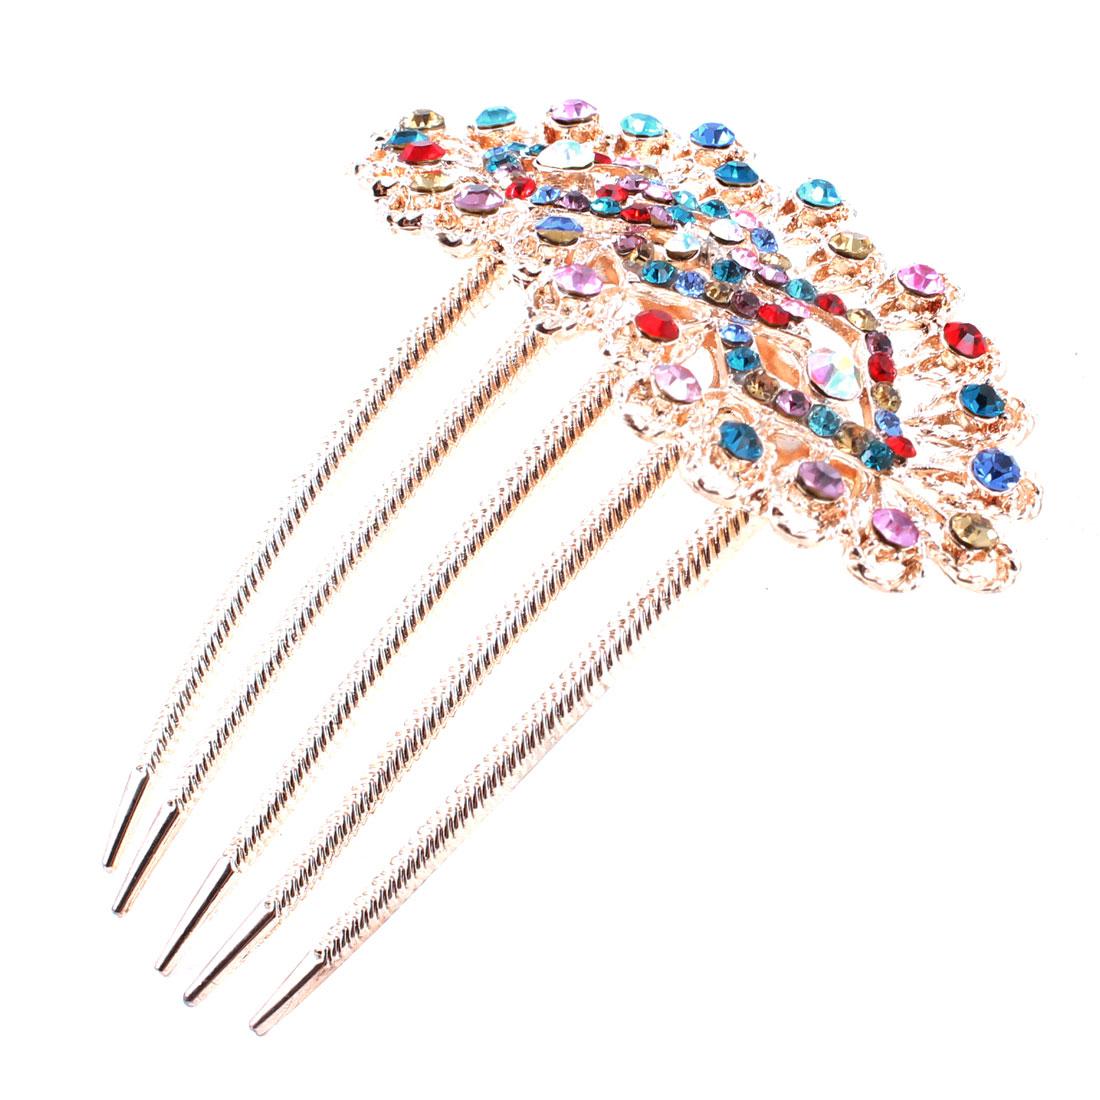 Shiny Gold Tone Metal 5 Teeth Design Hair Comb Clip Decor for Women